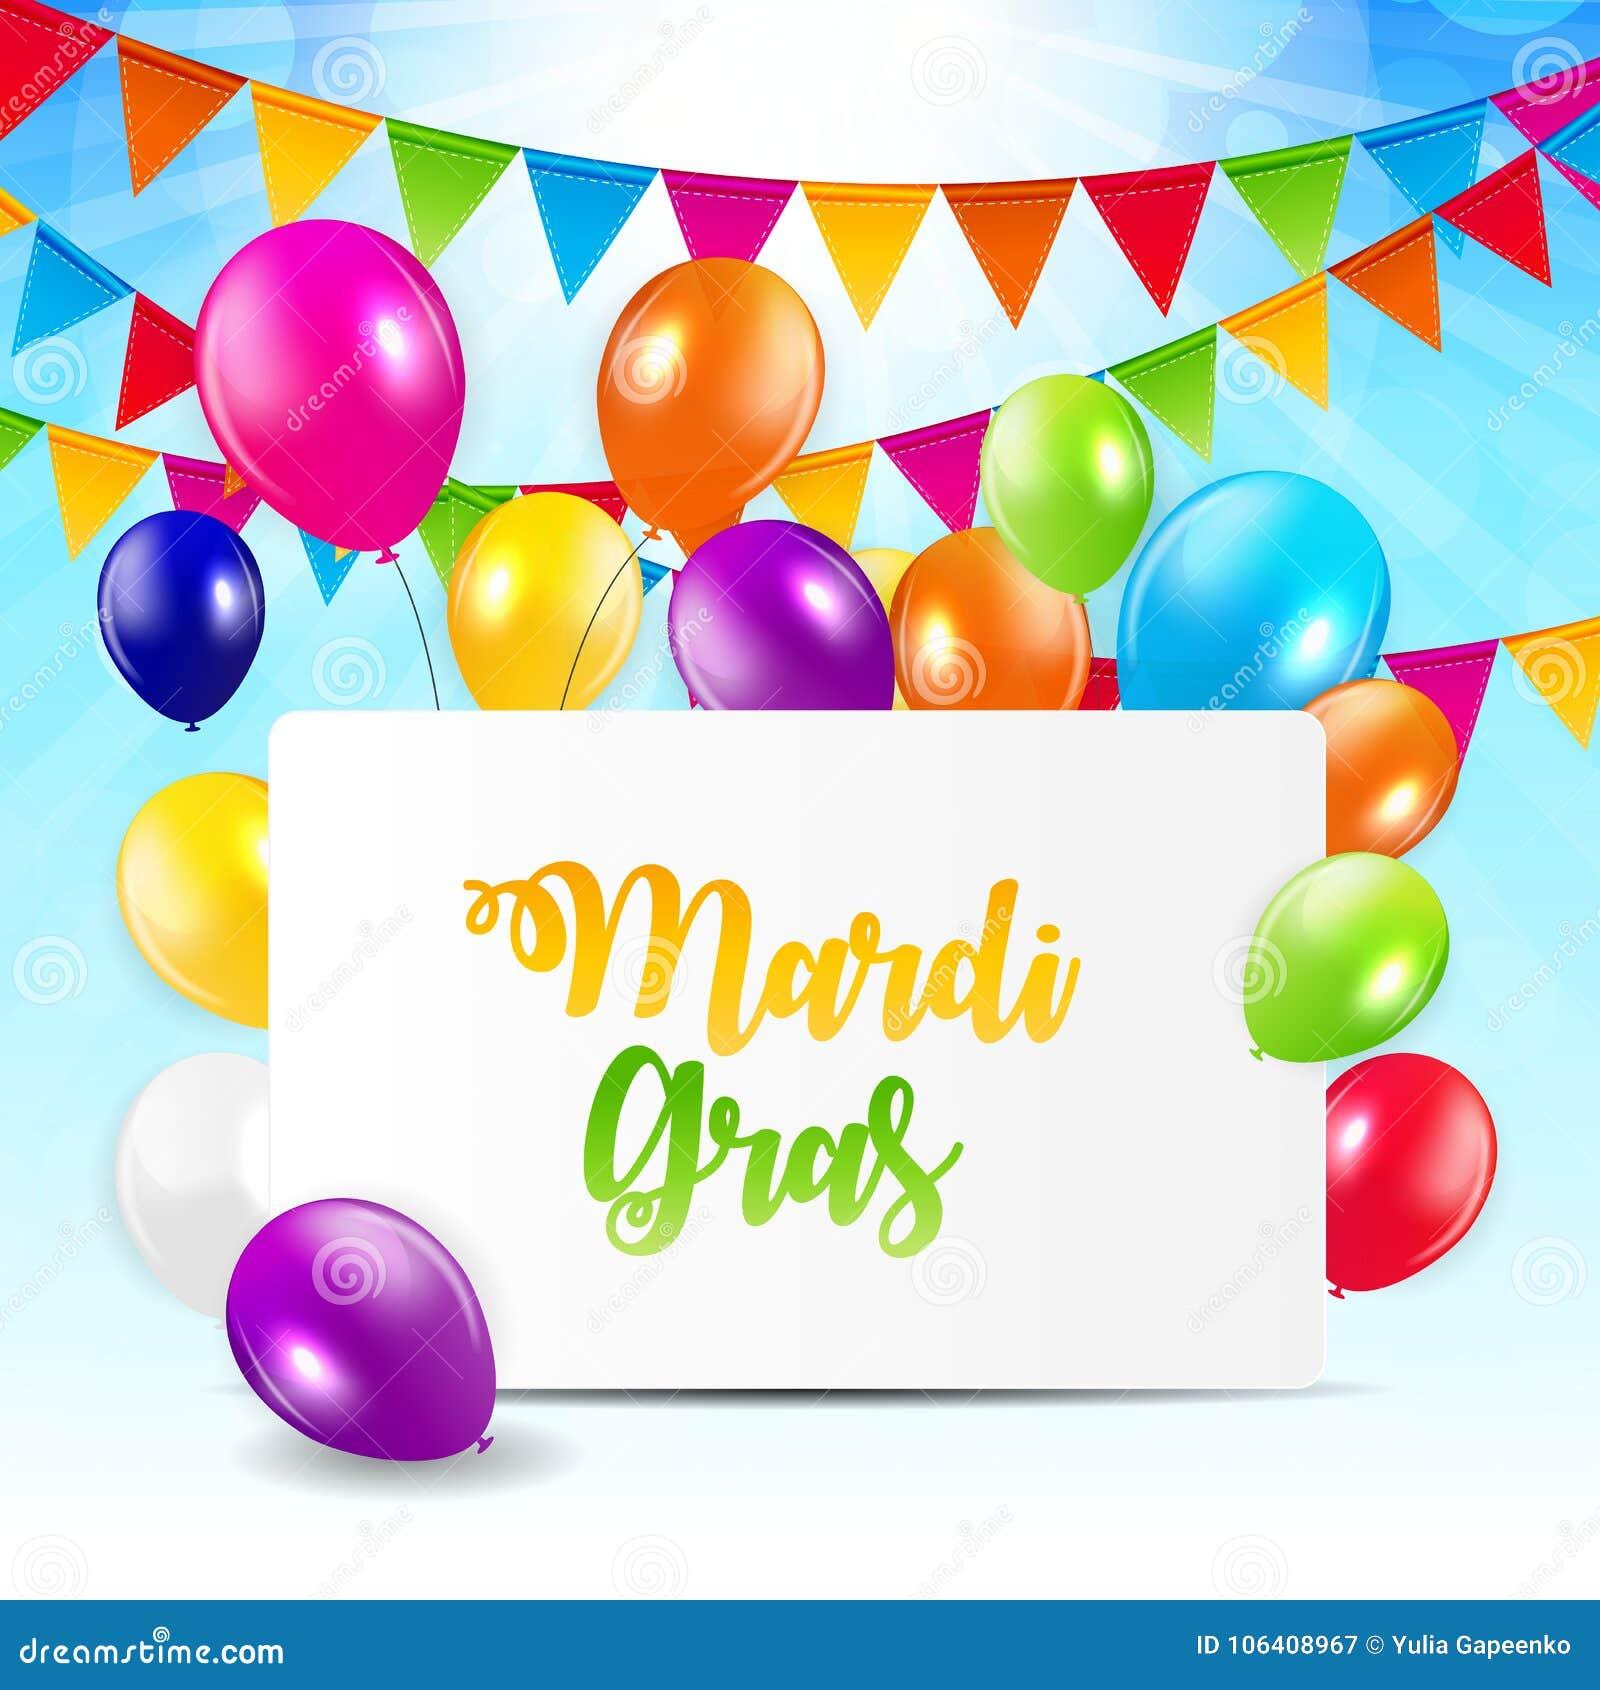 Mardi Gras Brochure Template.Celebration Greeting Card Backround. Vecor Illustration